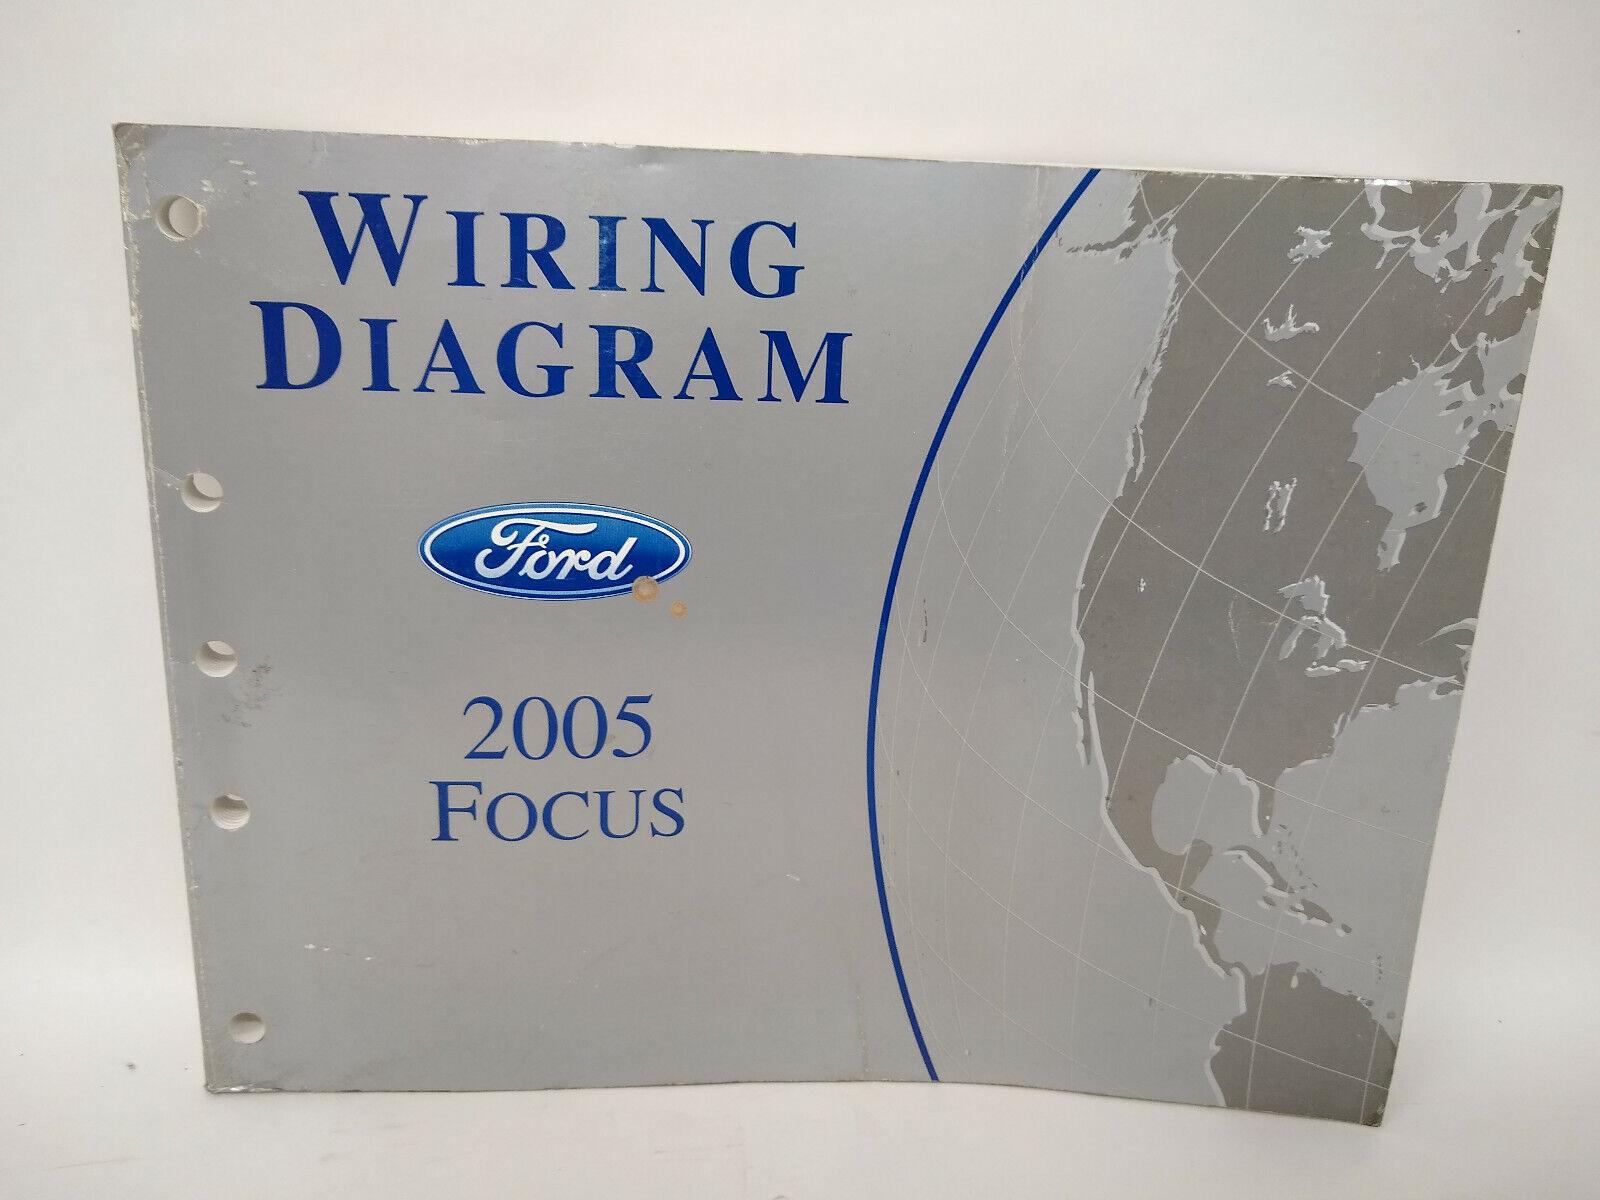 [TBQL_4184]  2005 Ford Focus OEM Wiring Diagrams Manual for sale online | eBay | 2005 Focus Wiring Diagram |  | eBay